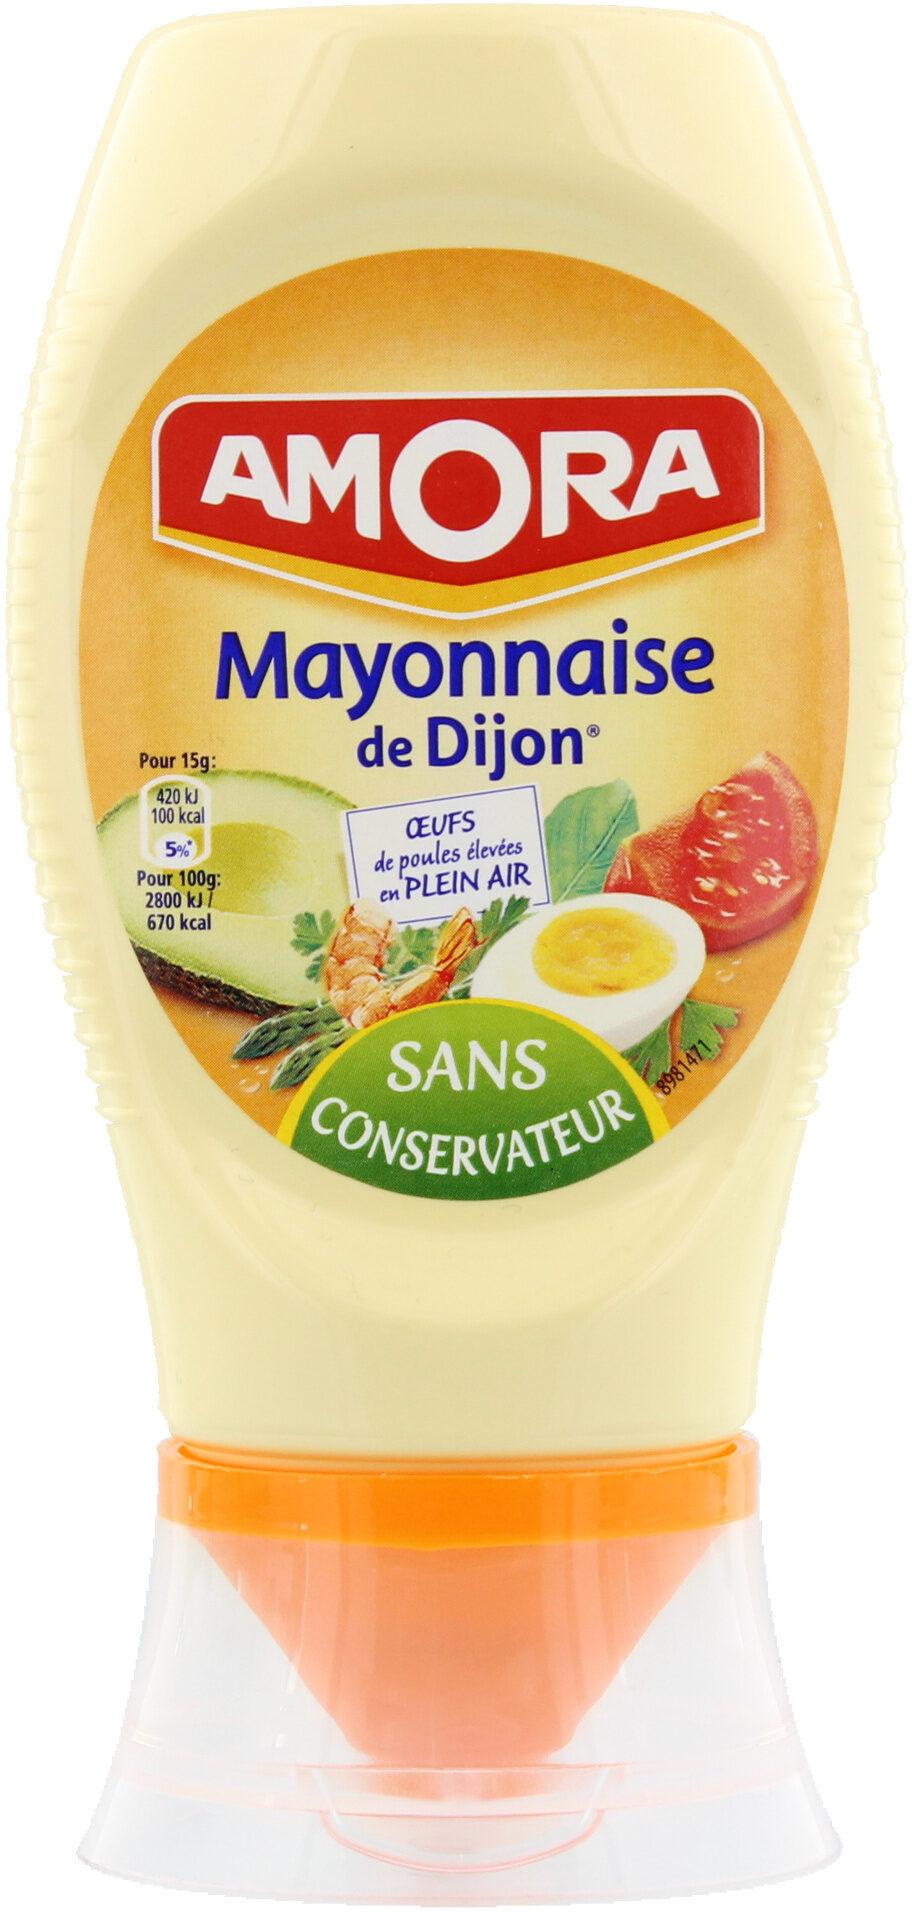 Amora Mayonnaise De Dijon - Product - fr